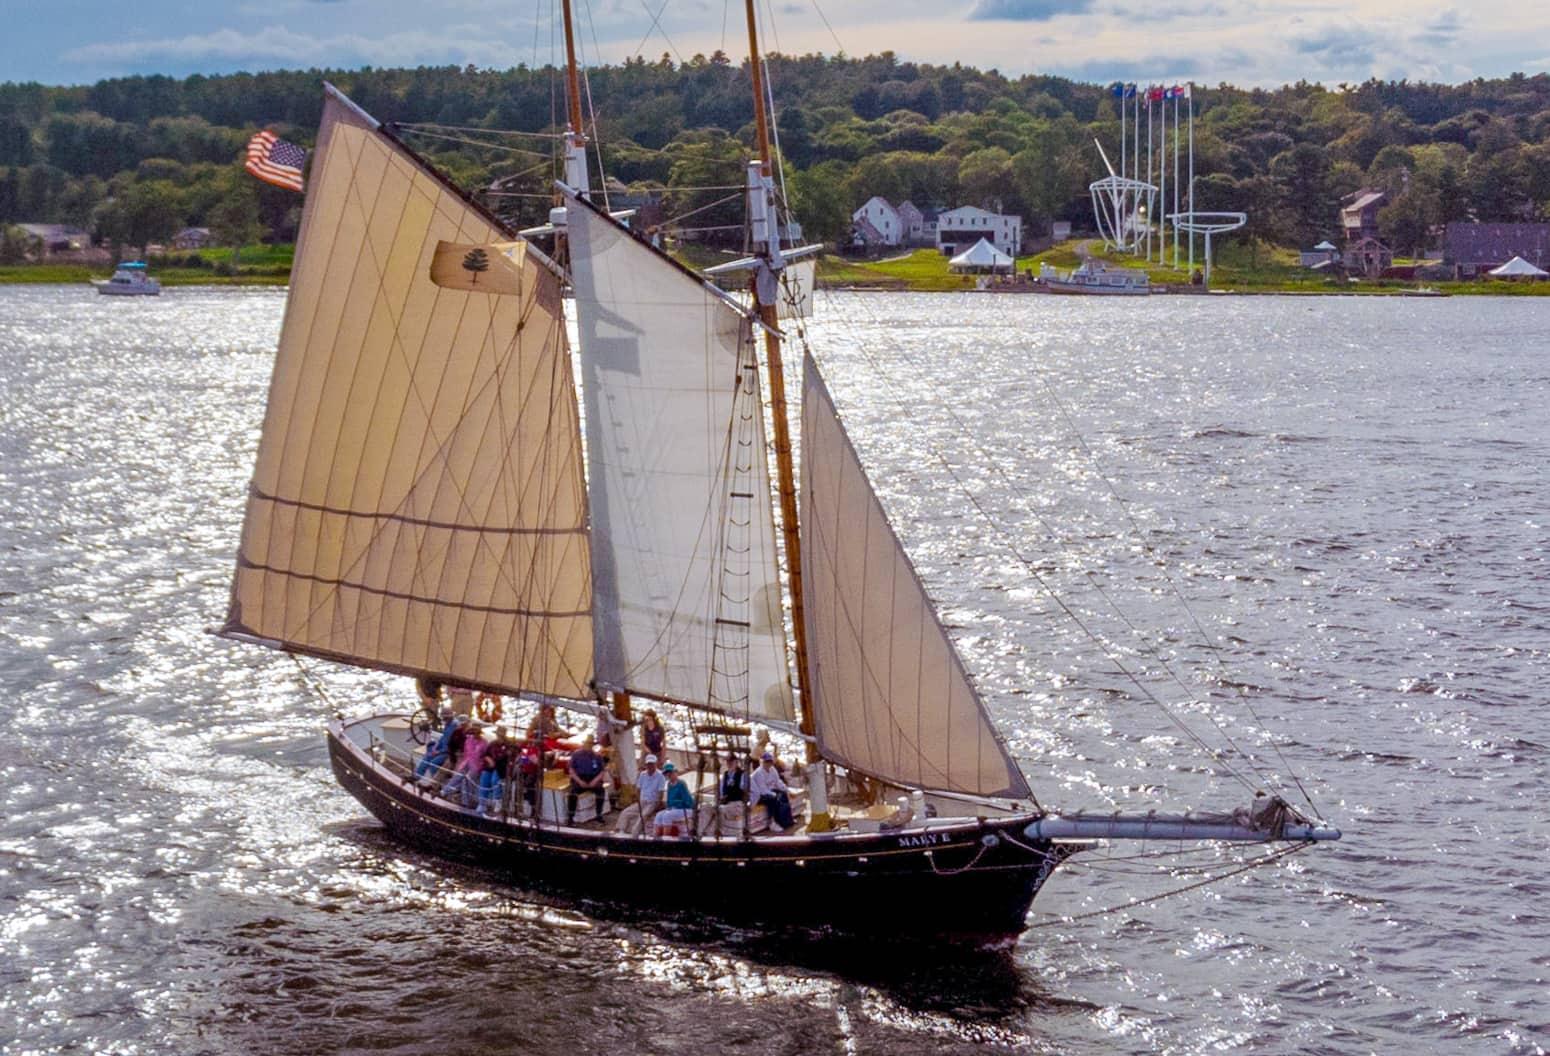 A historic ship sailing of the coast of Maine